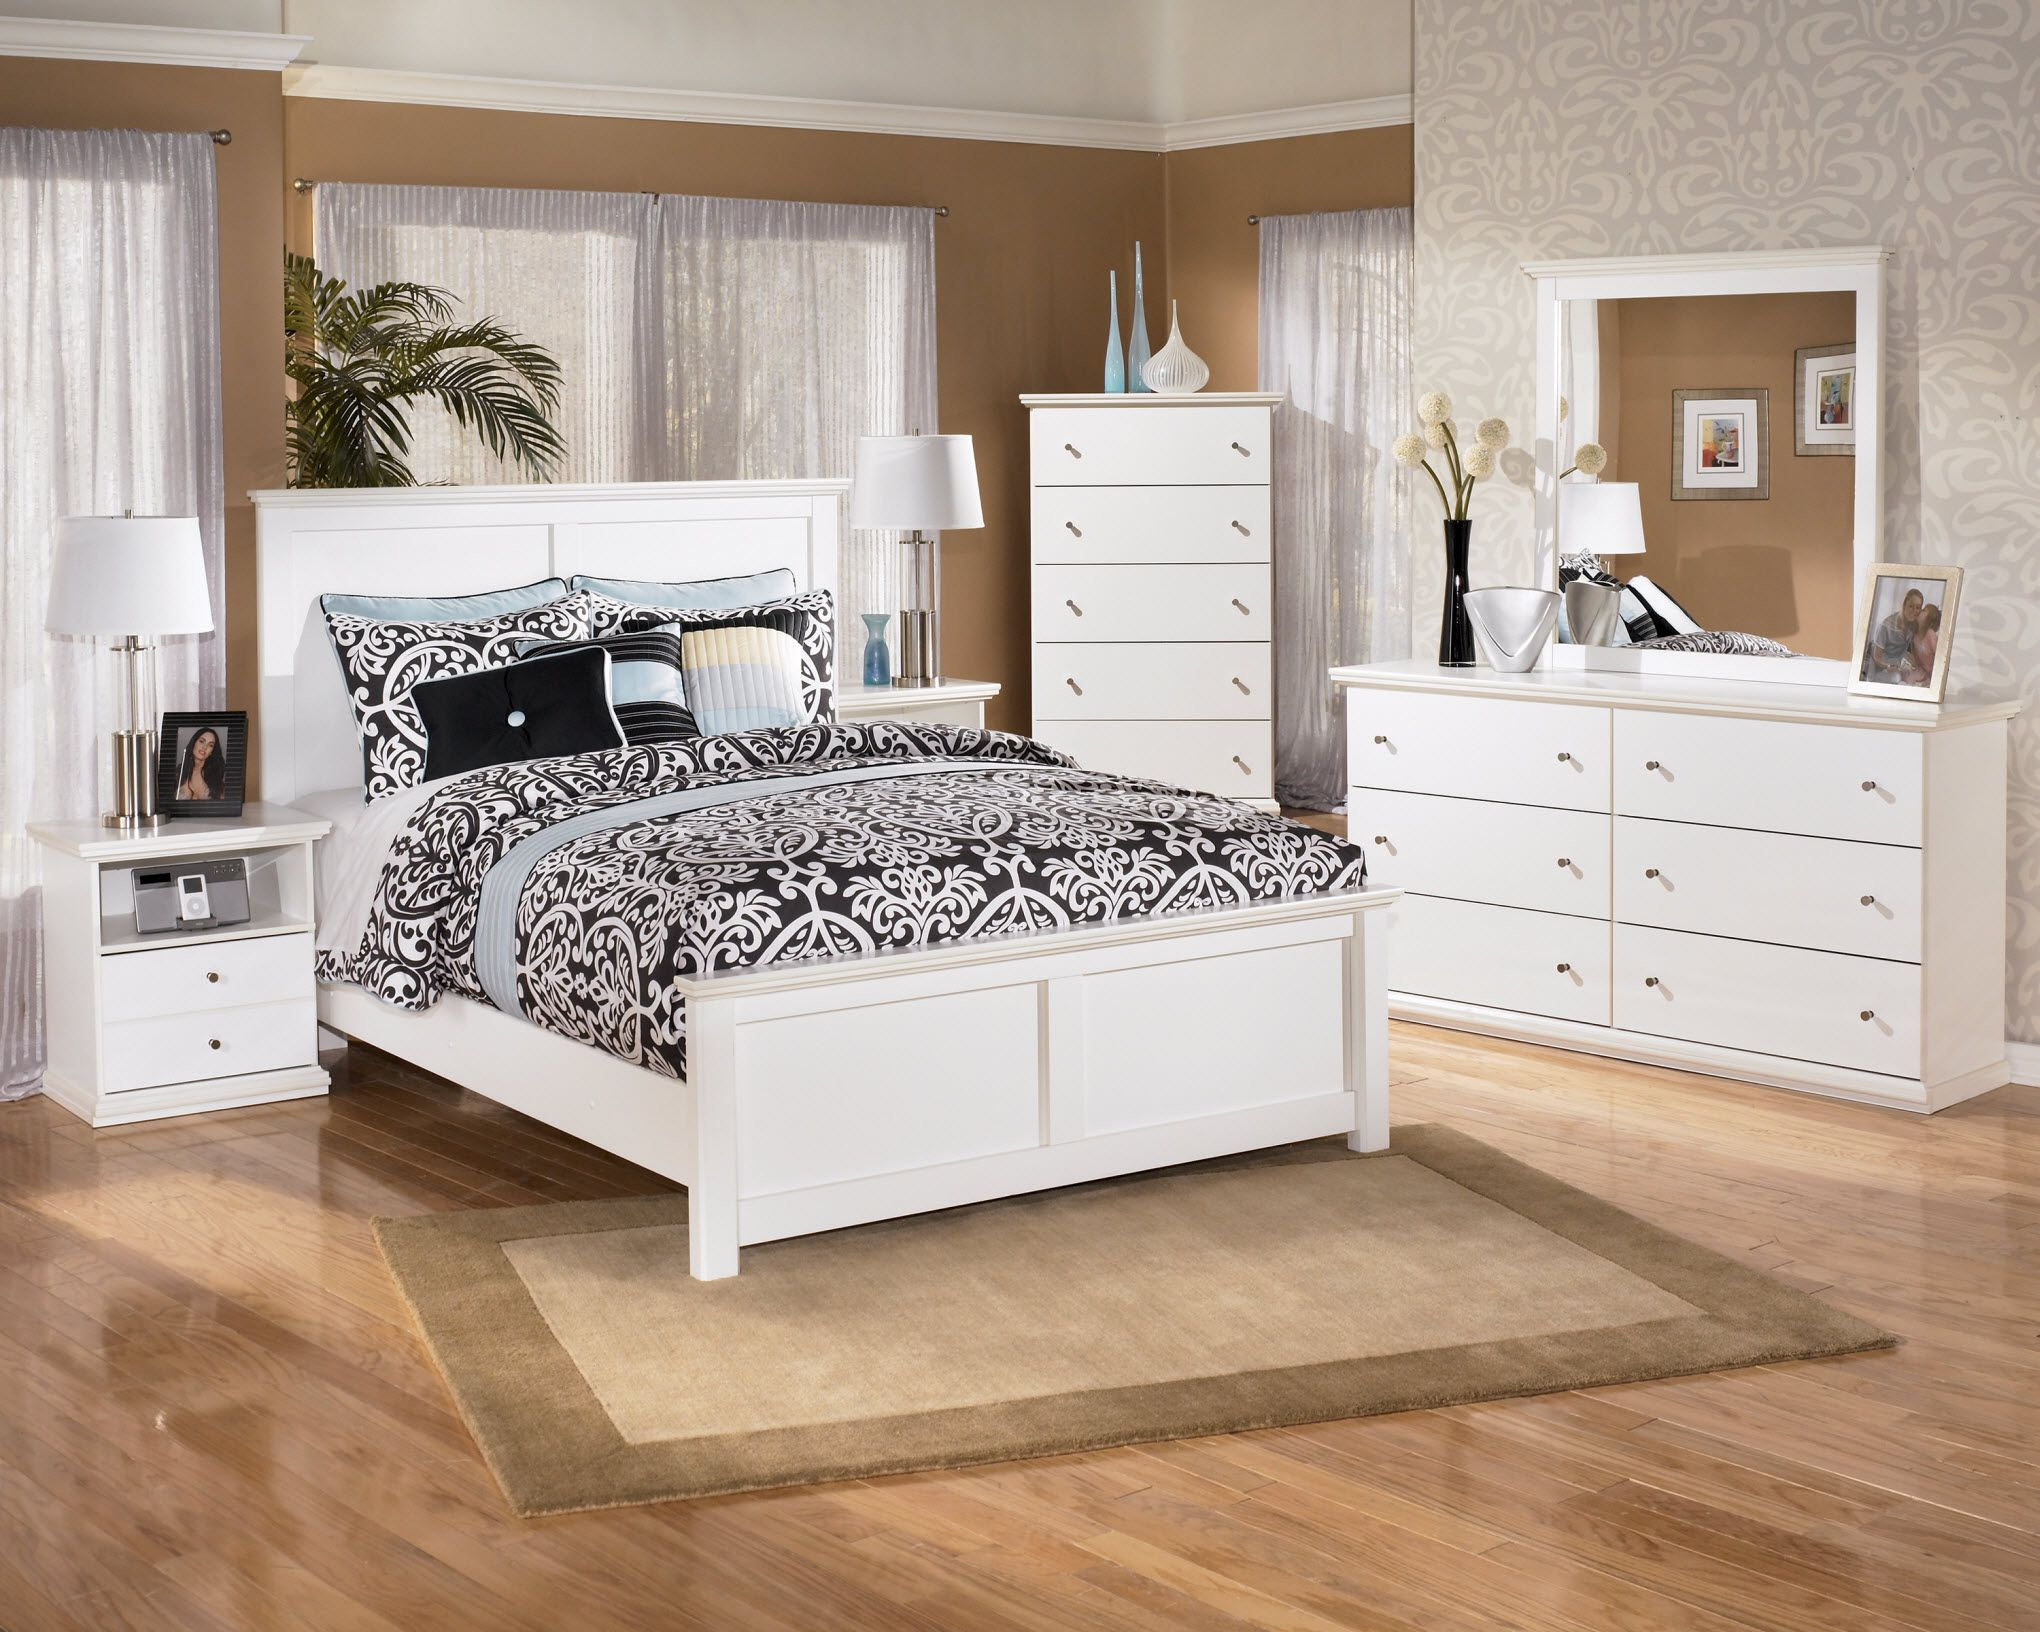 Merveilleux Bostwick Shoals Solid White Cottage Style Bedroom Set | Wholesale Furniture  Stores Chicago, IL |